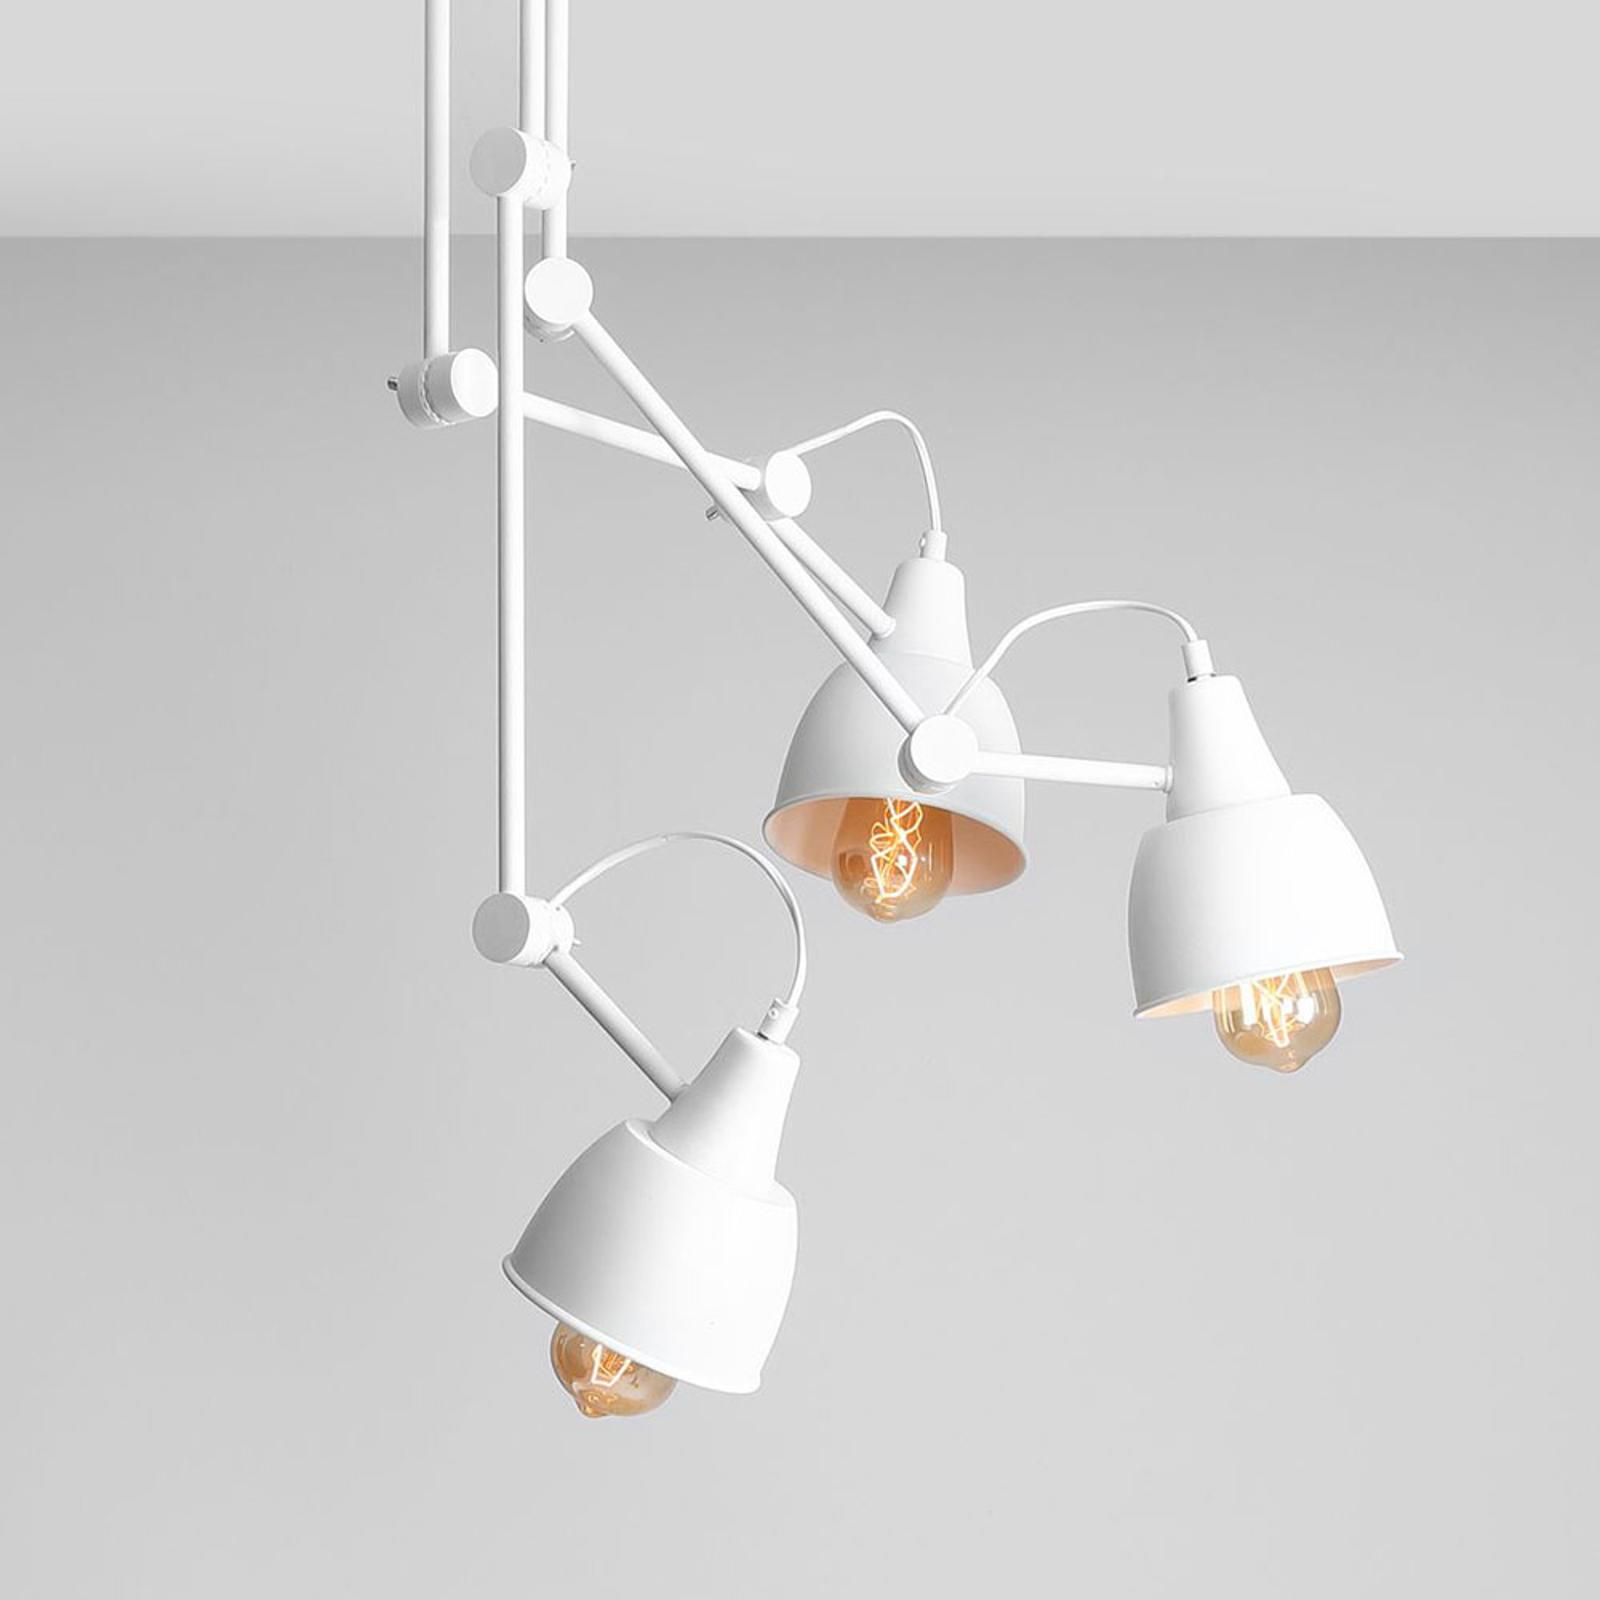 Plafondlamp 814, verstelbaar, 3-lamps, wit